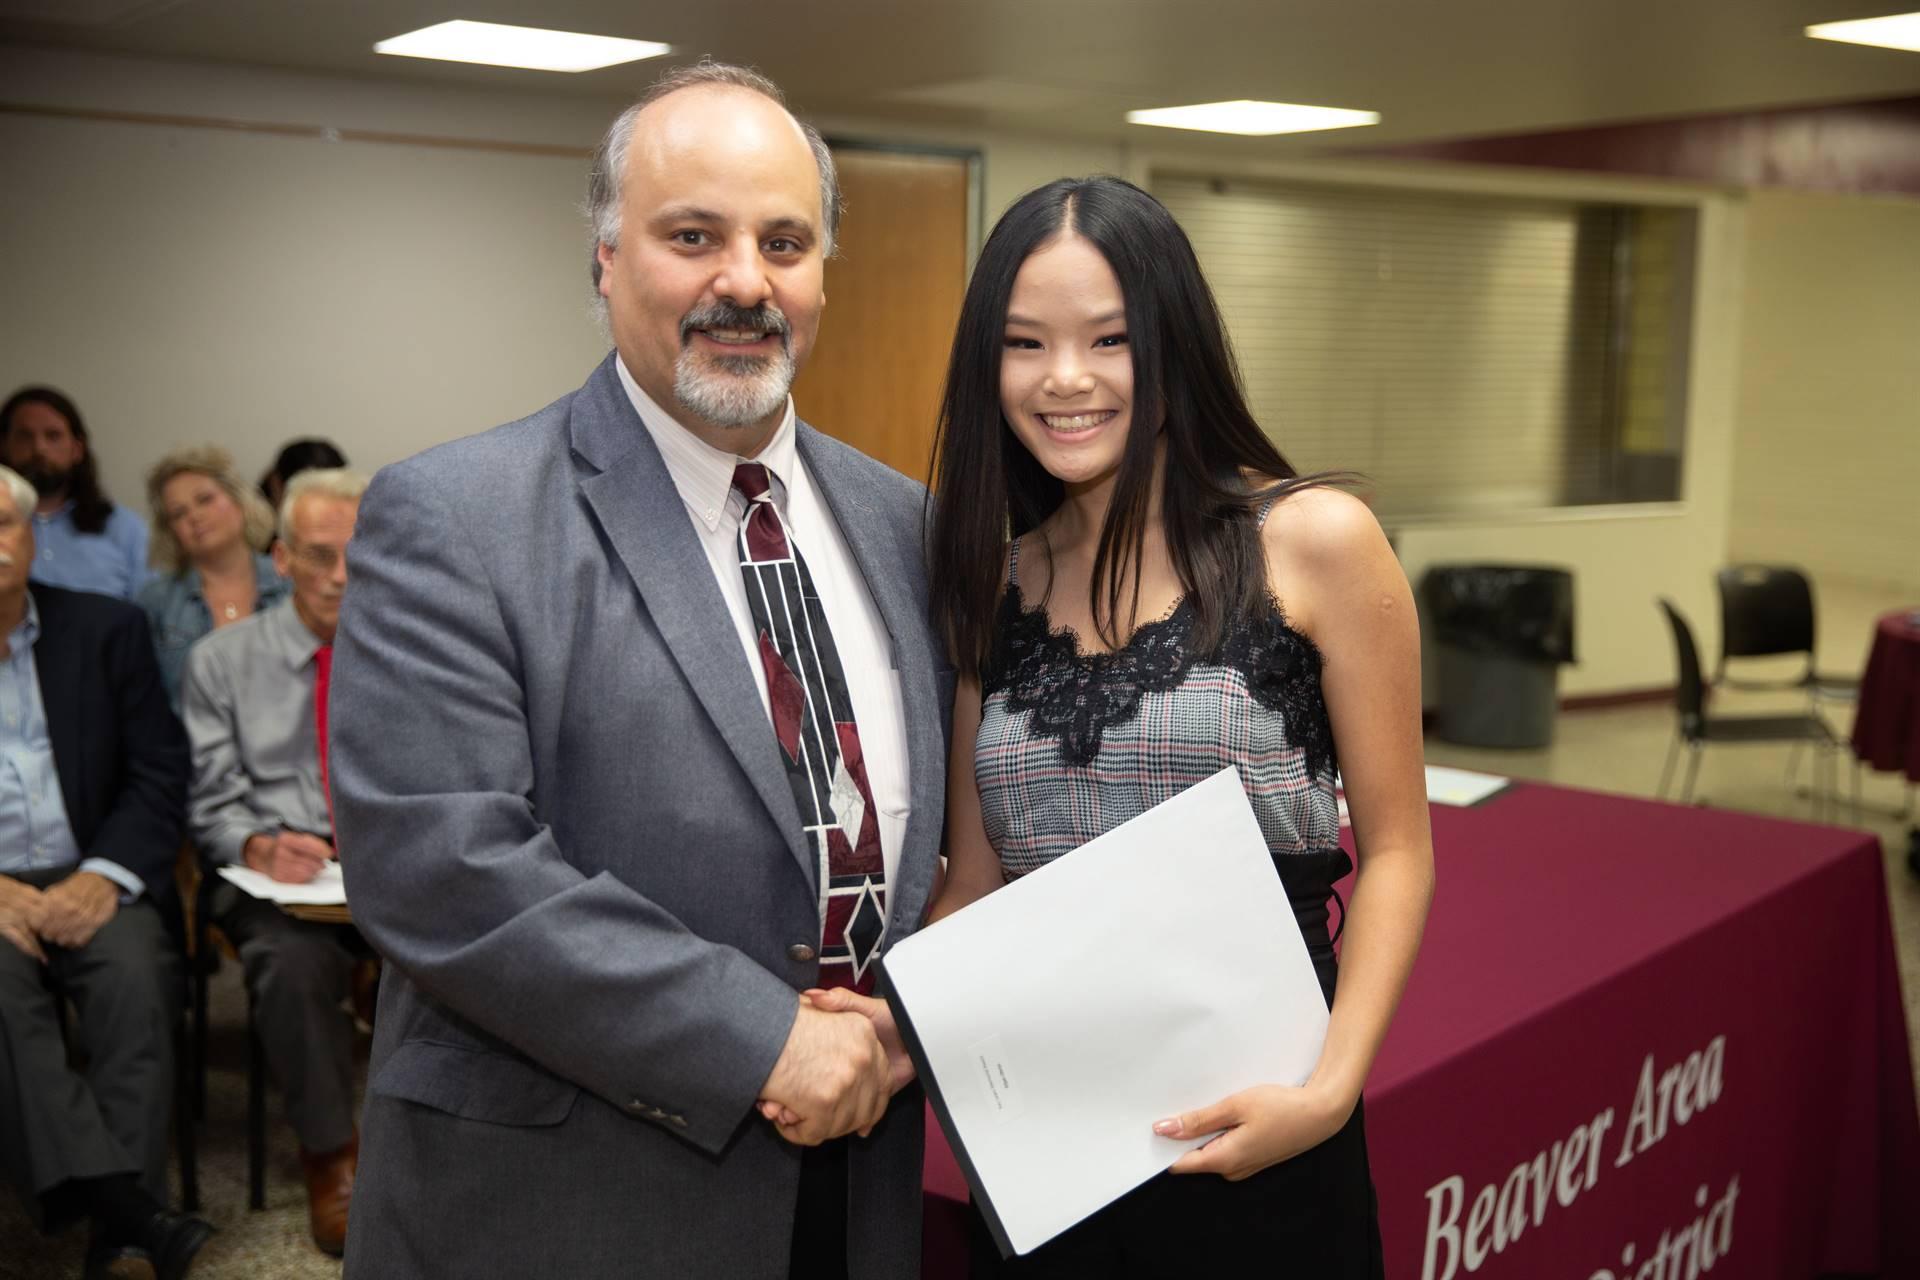 Presenting the BHS Alumni Award